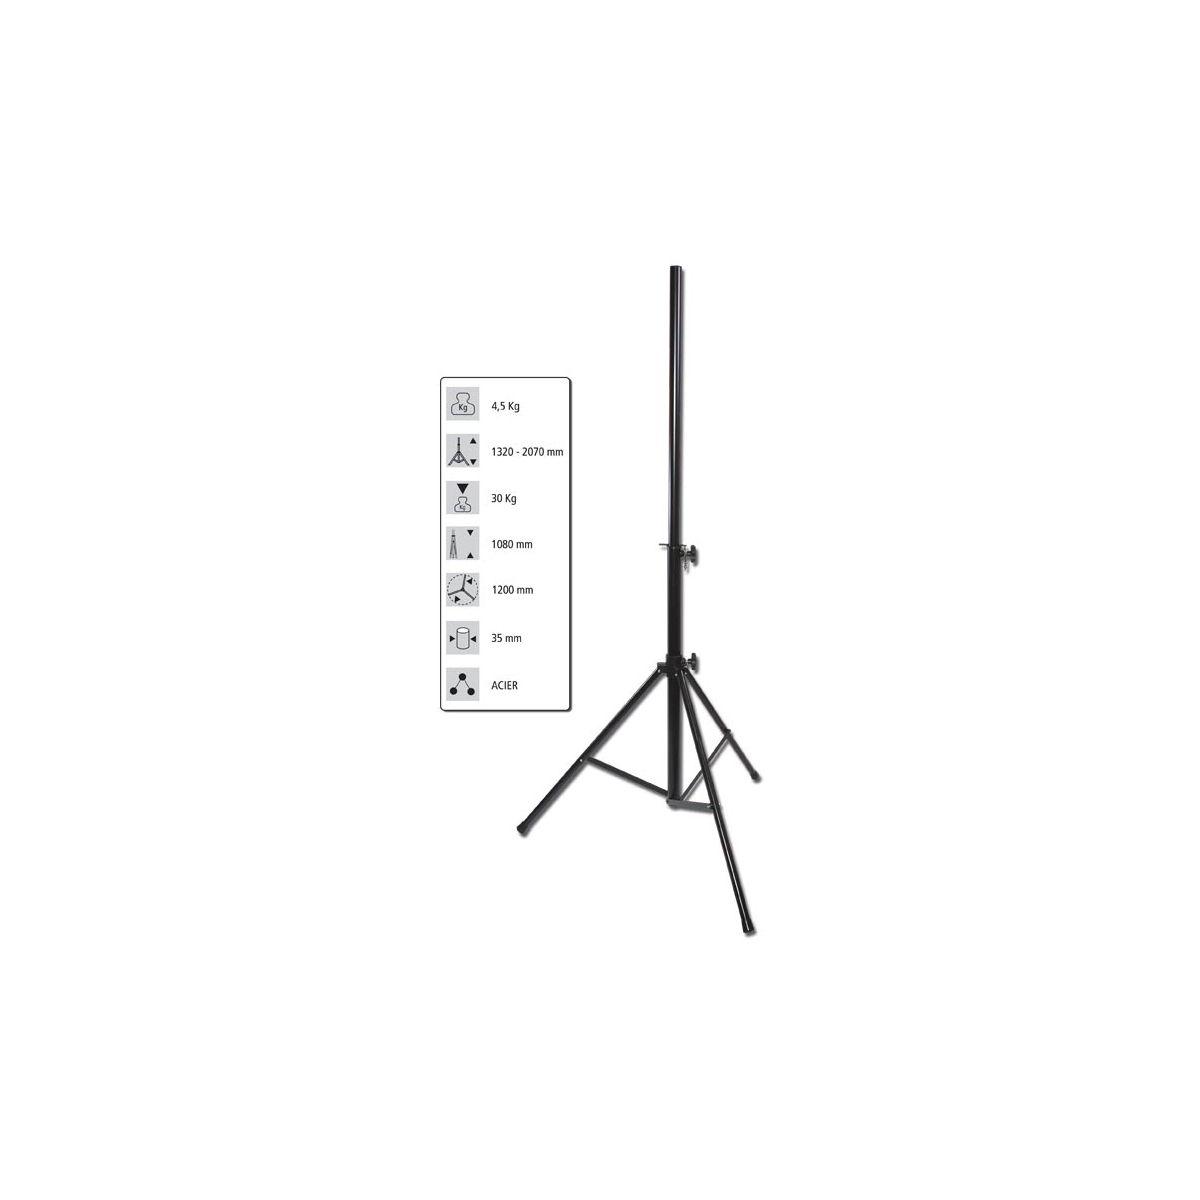 Trépieds enceintes - Audiophony - CAB-200